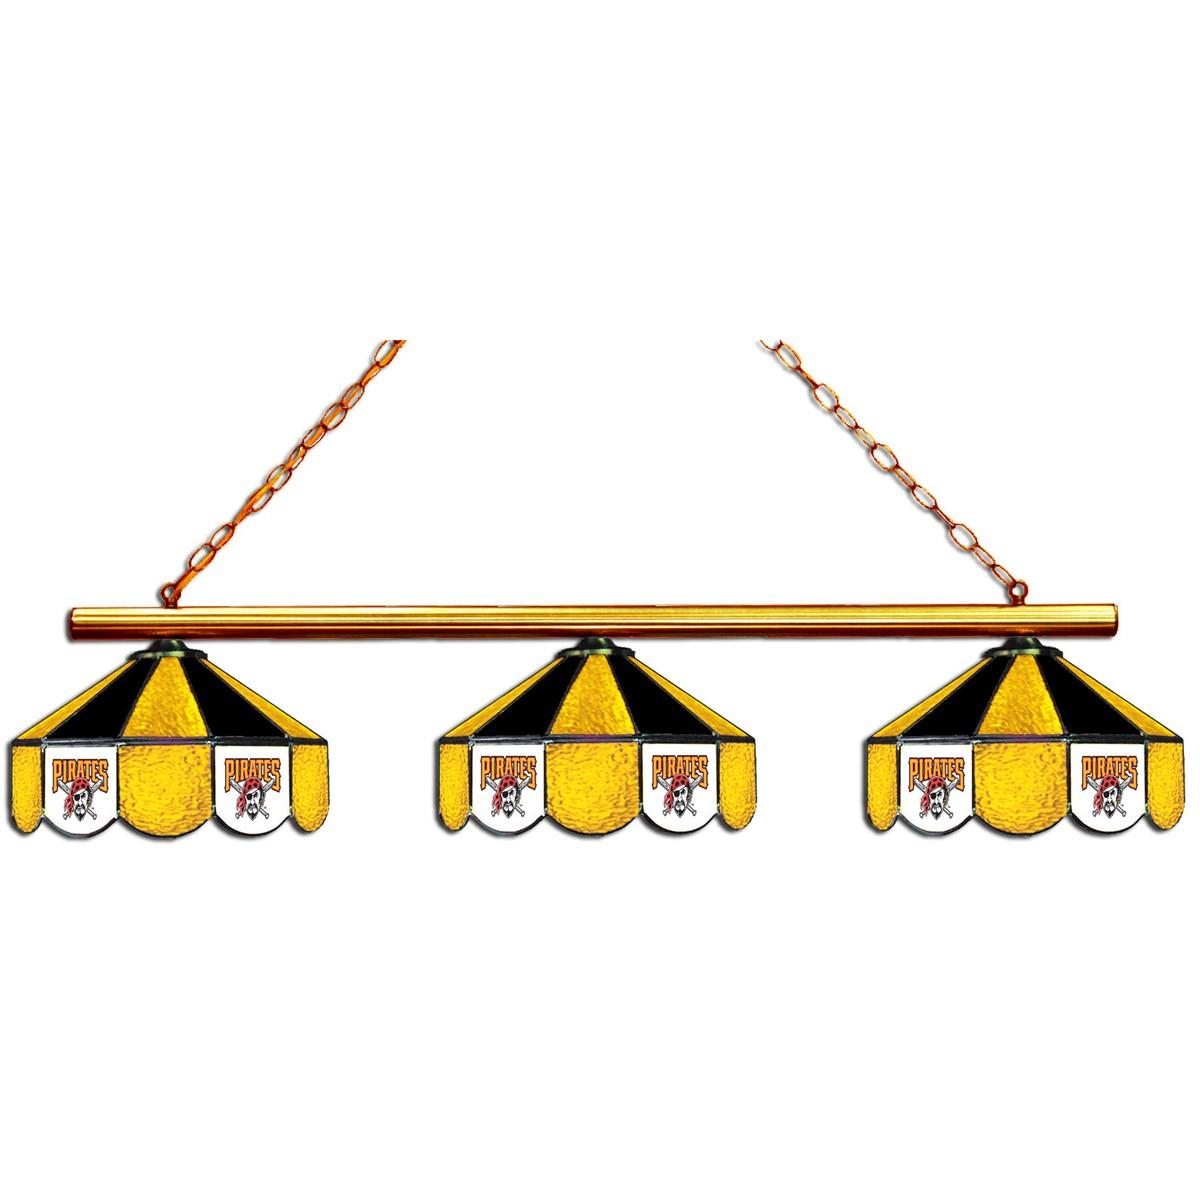 PITTSBURGH PIRATES 3 SHADE GLASS LAMP